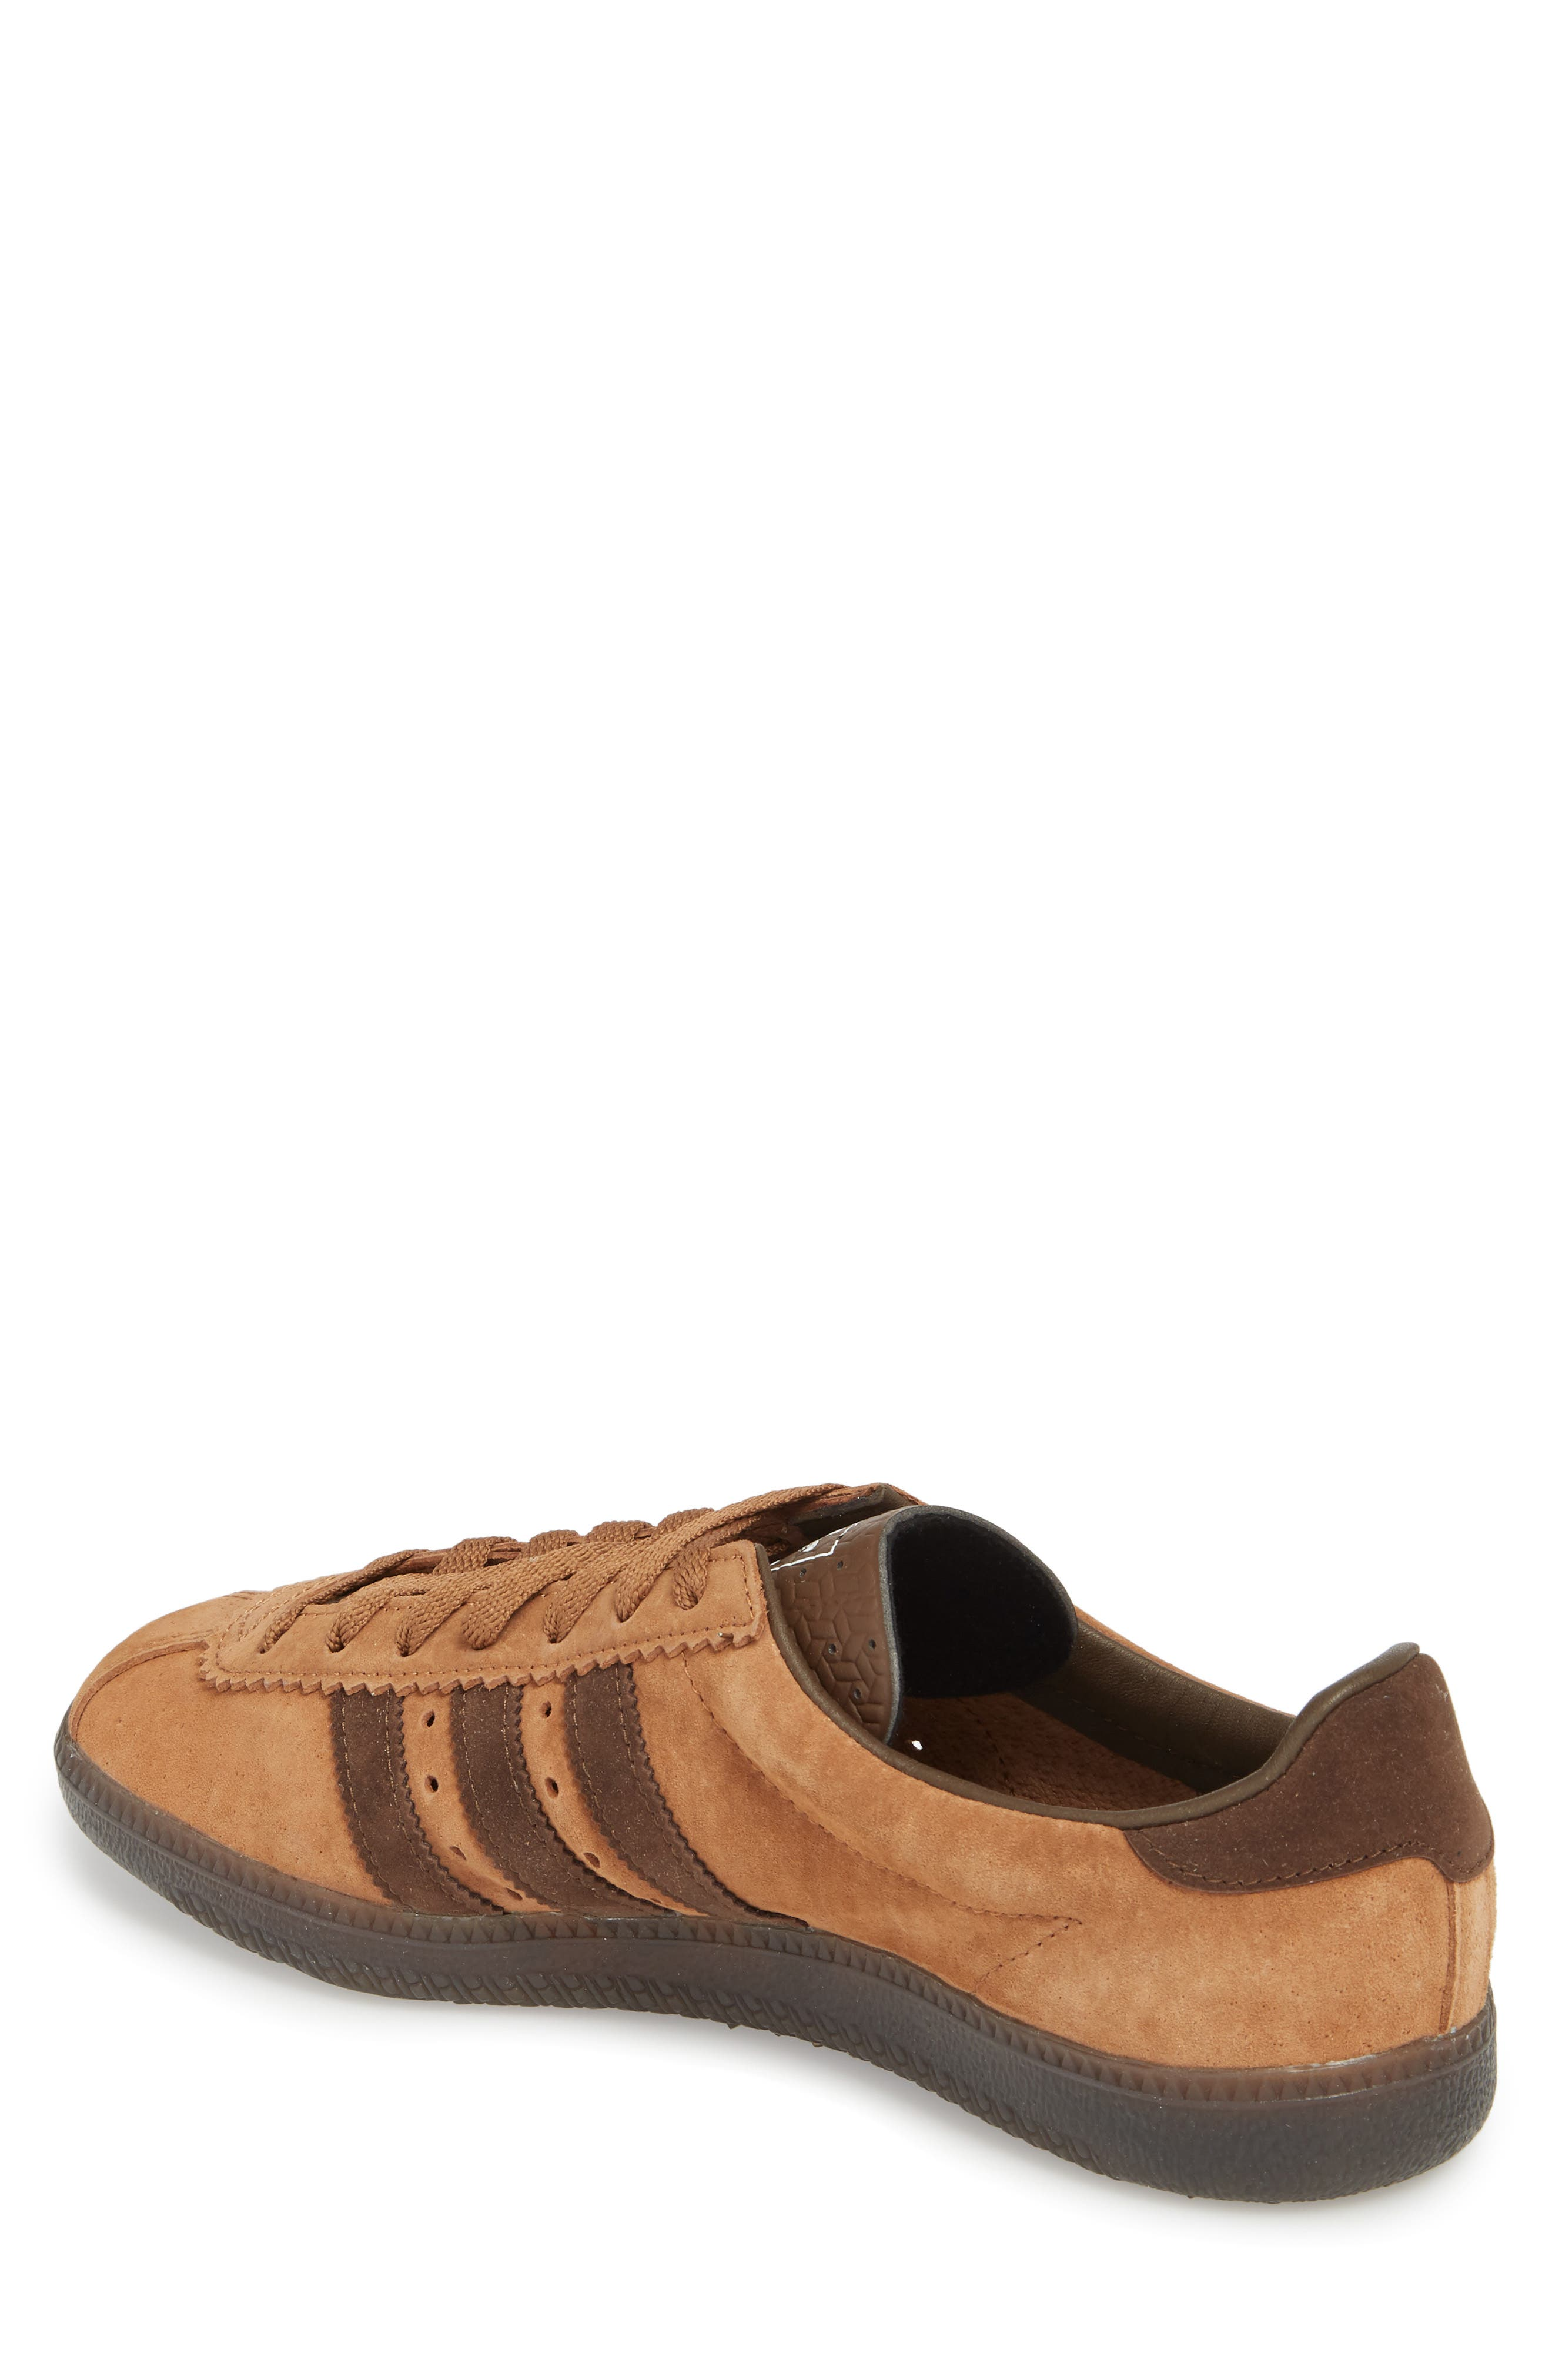 Padiham SPZL Sneaker,                             Alternate thumbnail 2, color,                             200